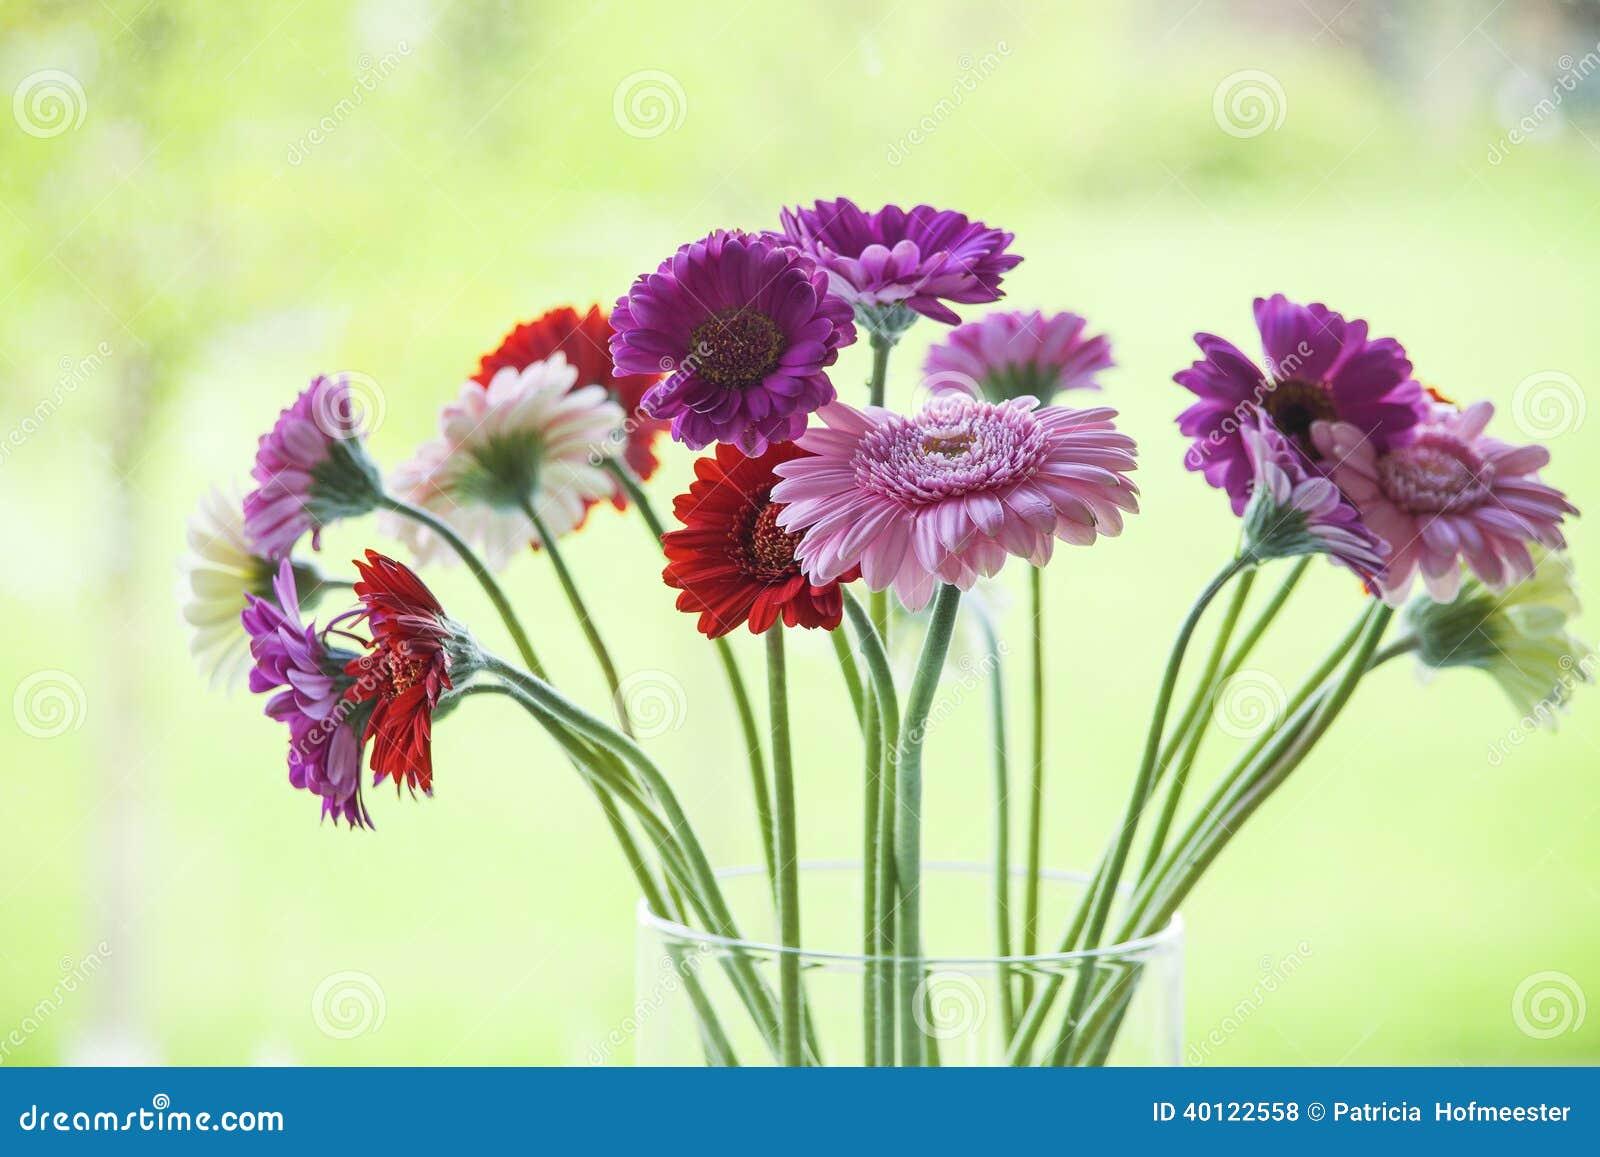 Beautiful Gerbera Daisies In A Vase Stock Photo - Image of ...